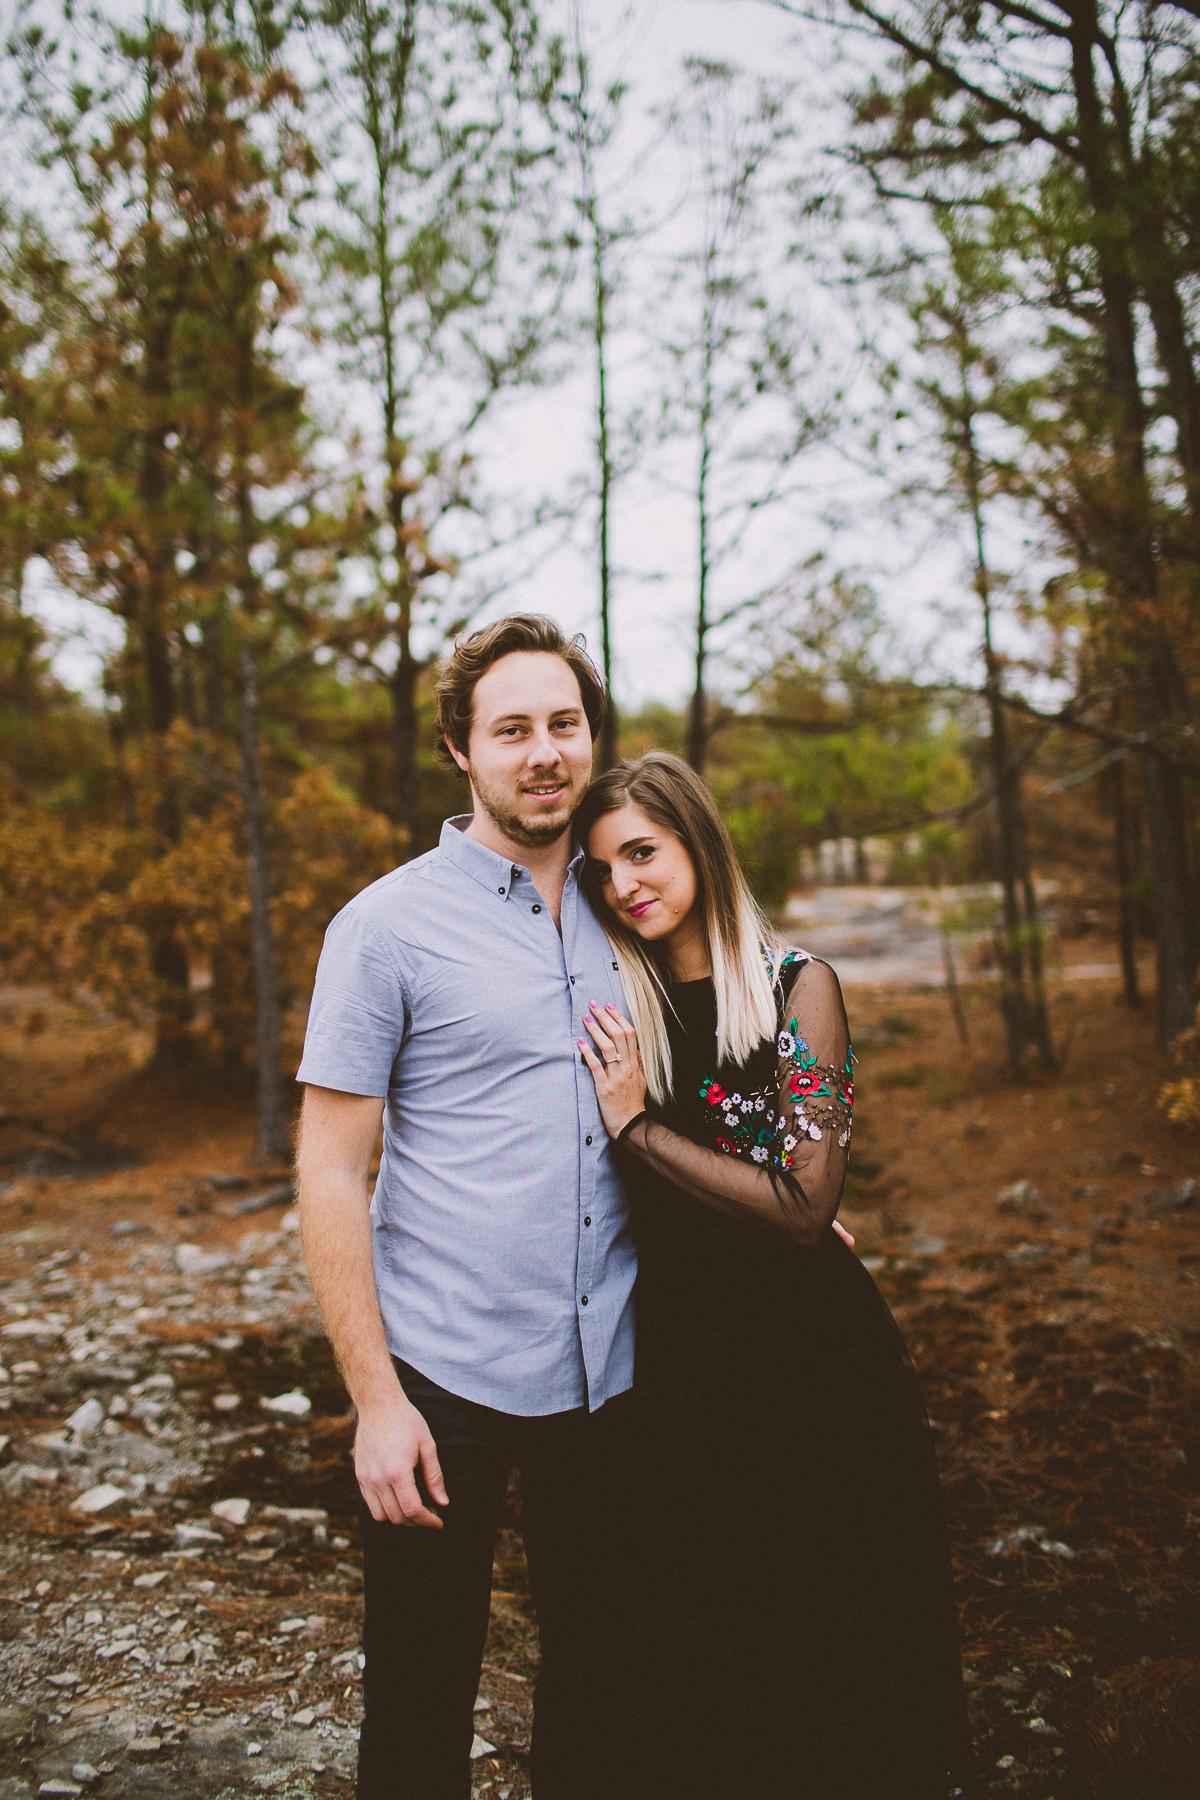 courtney-chris-engagement-kelley-raye-atlanta-wedding-photographer-4.jpg